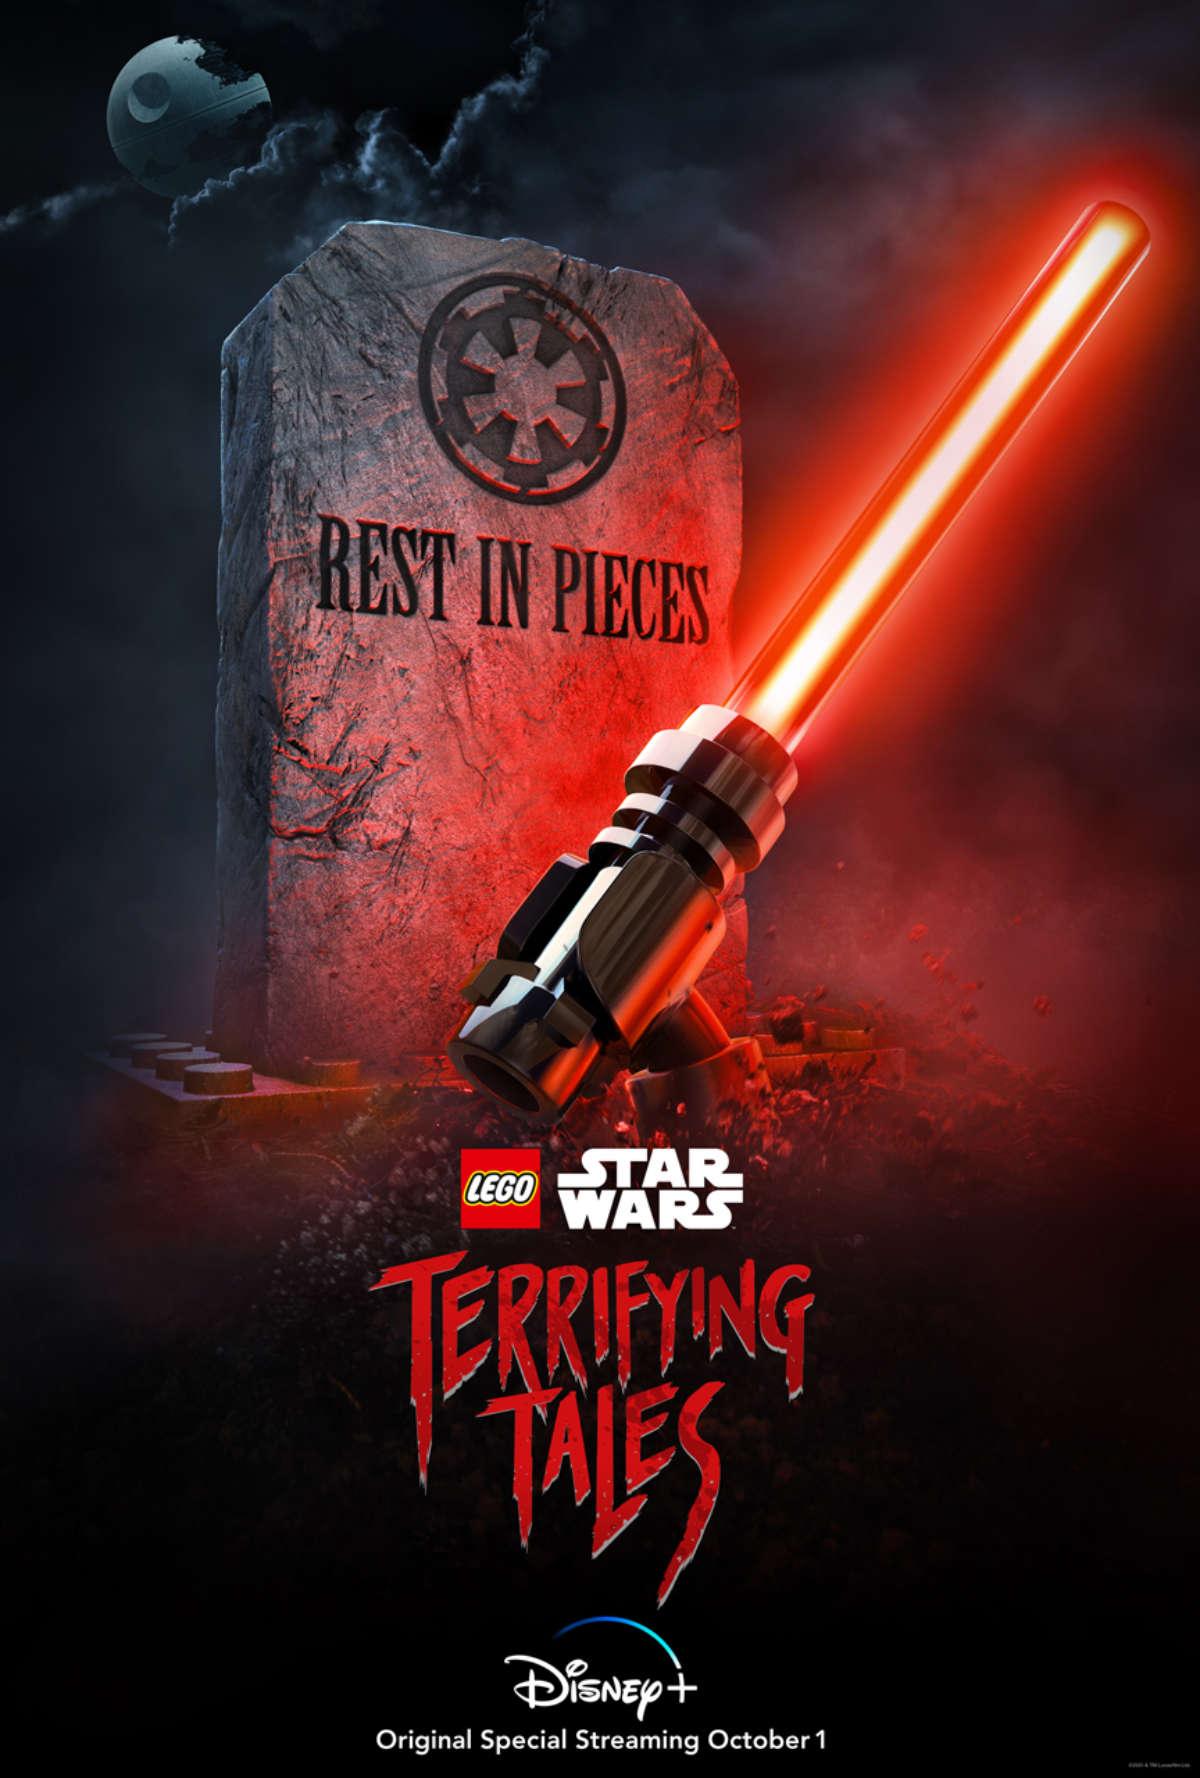 Disney+ Announces LEGO Star Wars Terrifying Tales